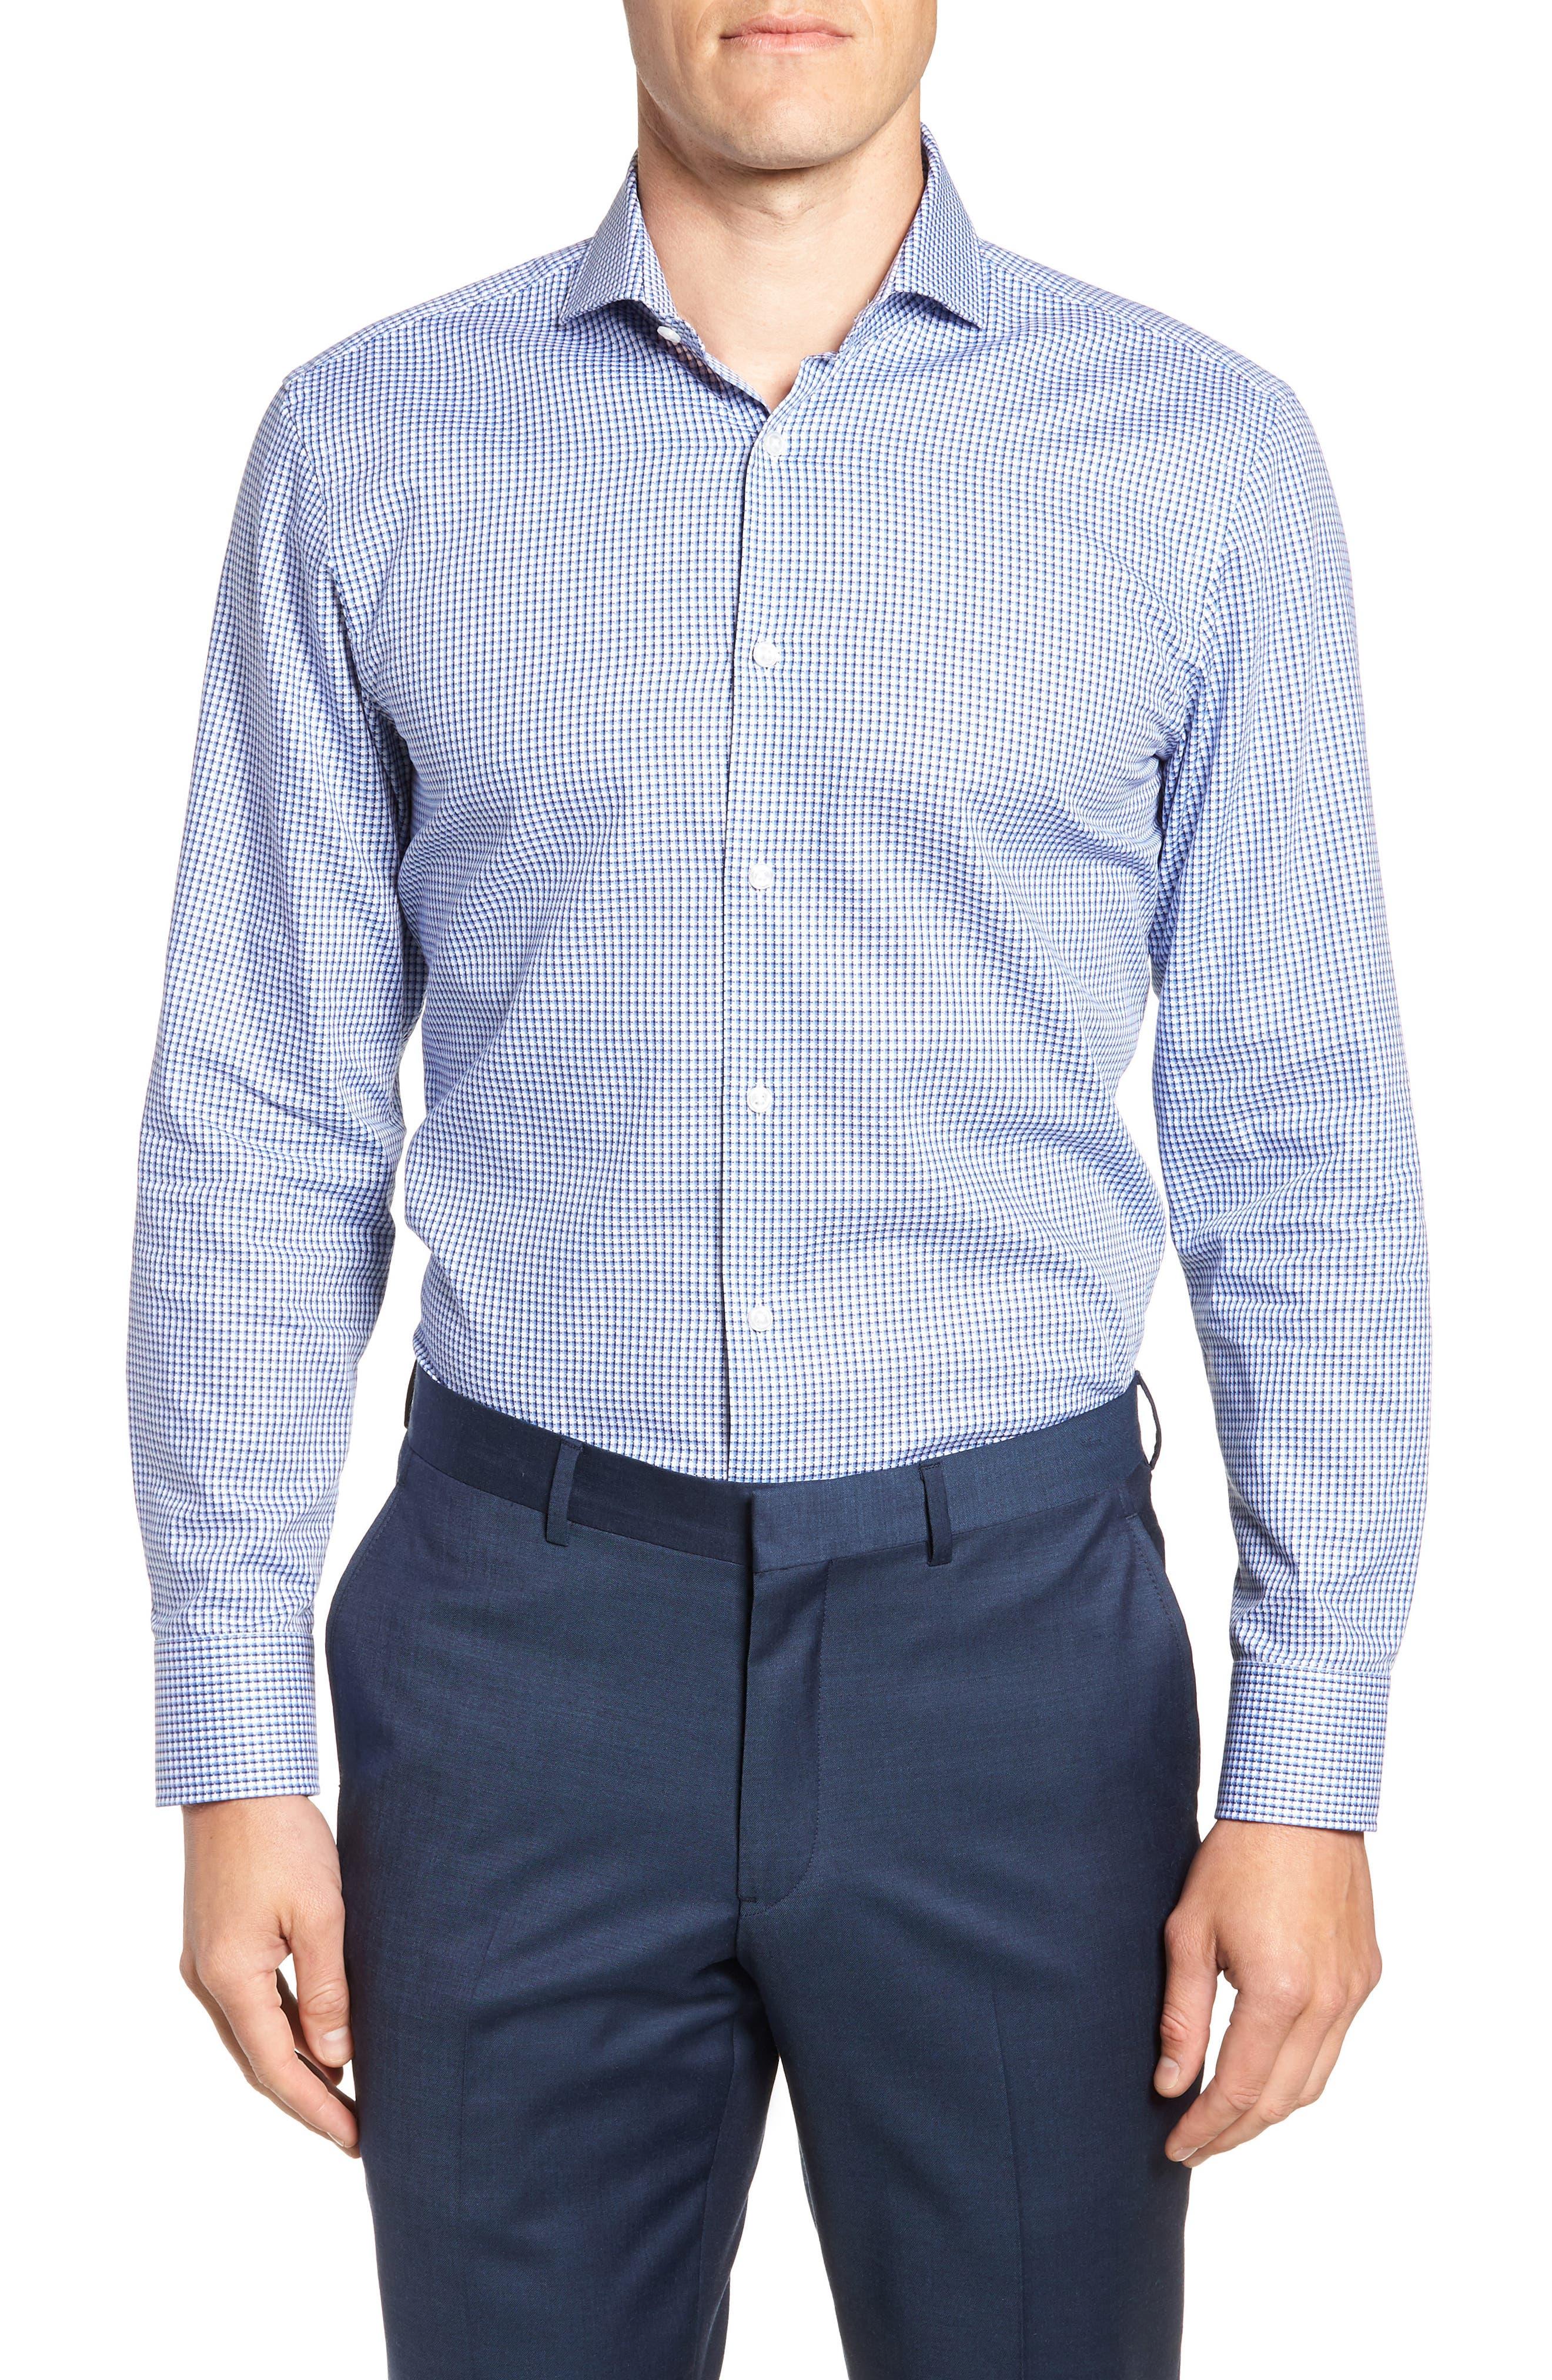 Mark Sharp Fit Check Dress Shirt,                         Main,                         color, BLUE